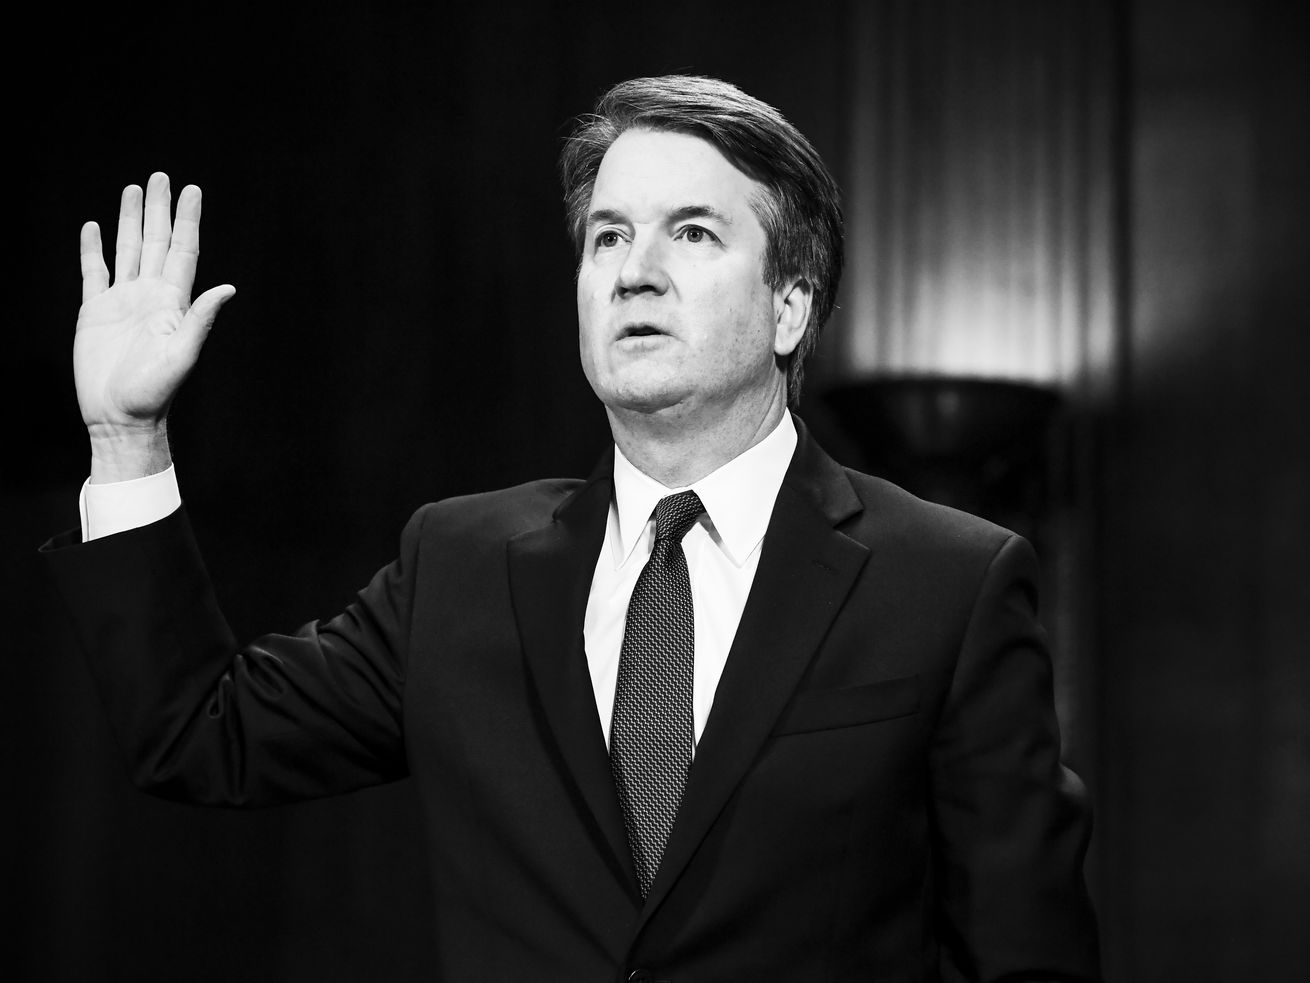 Brett Kavanaugh is sworn in at a Senate Judiciary Committee hearing on September 27, 2018.